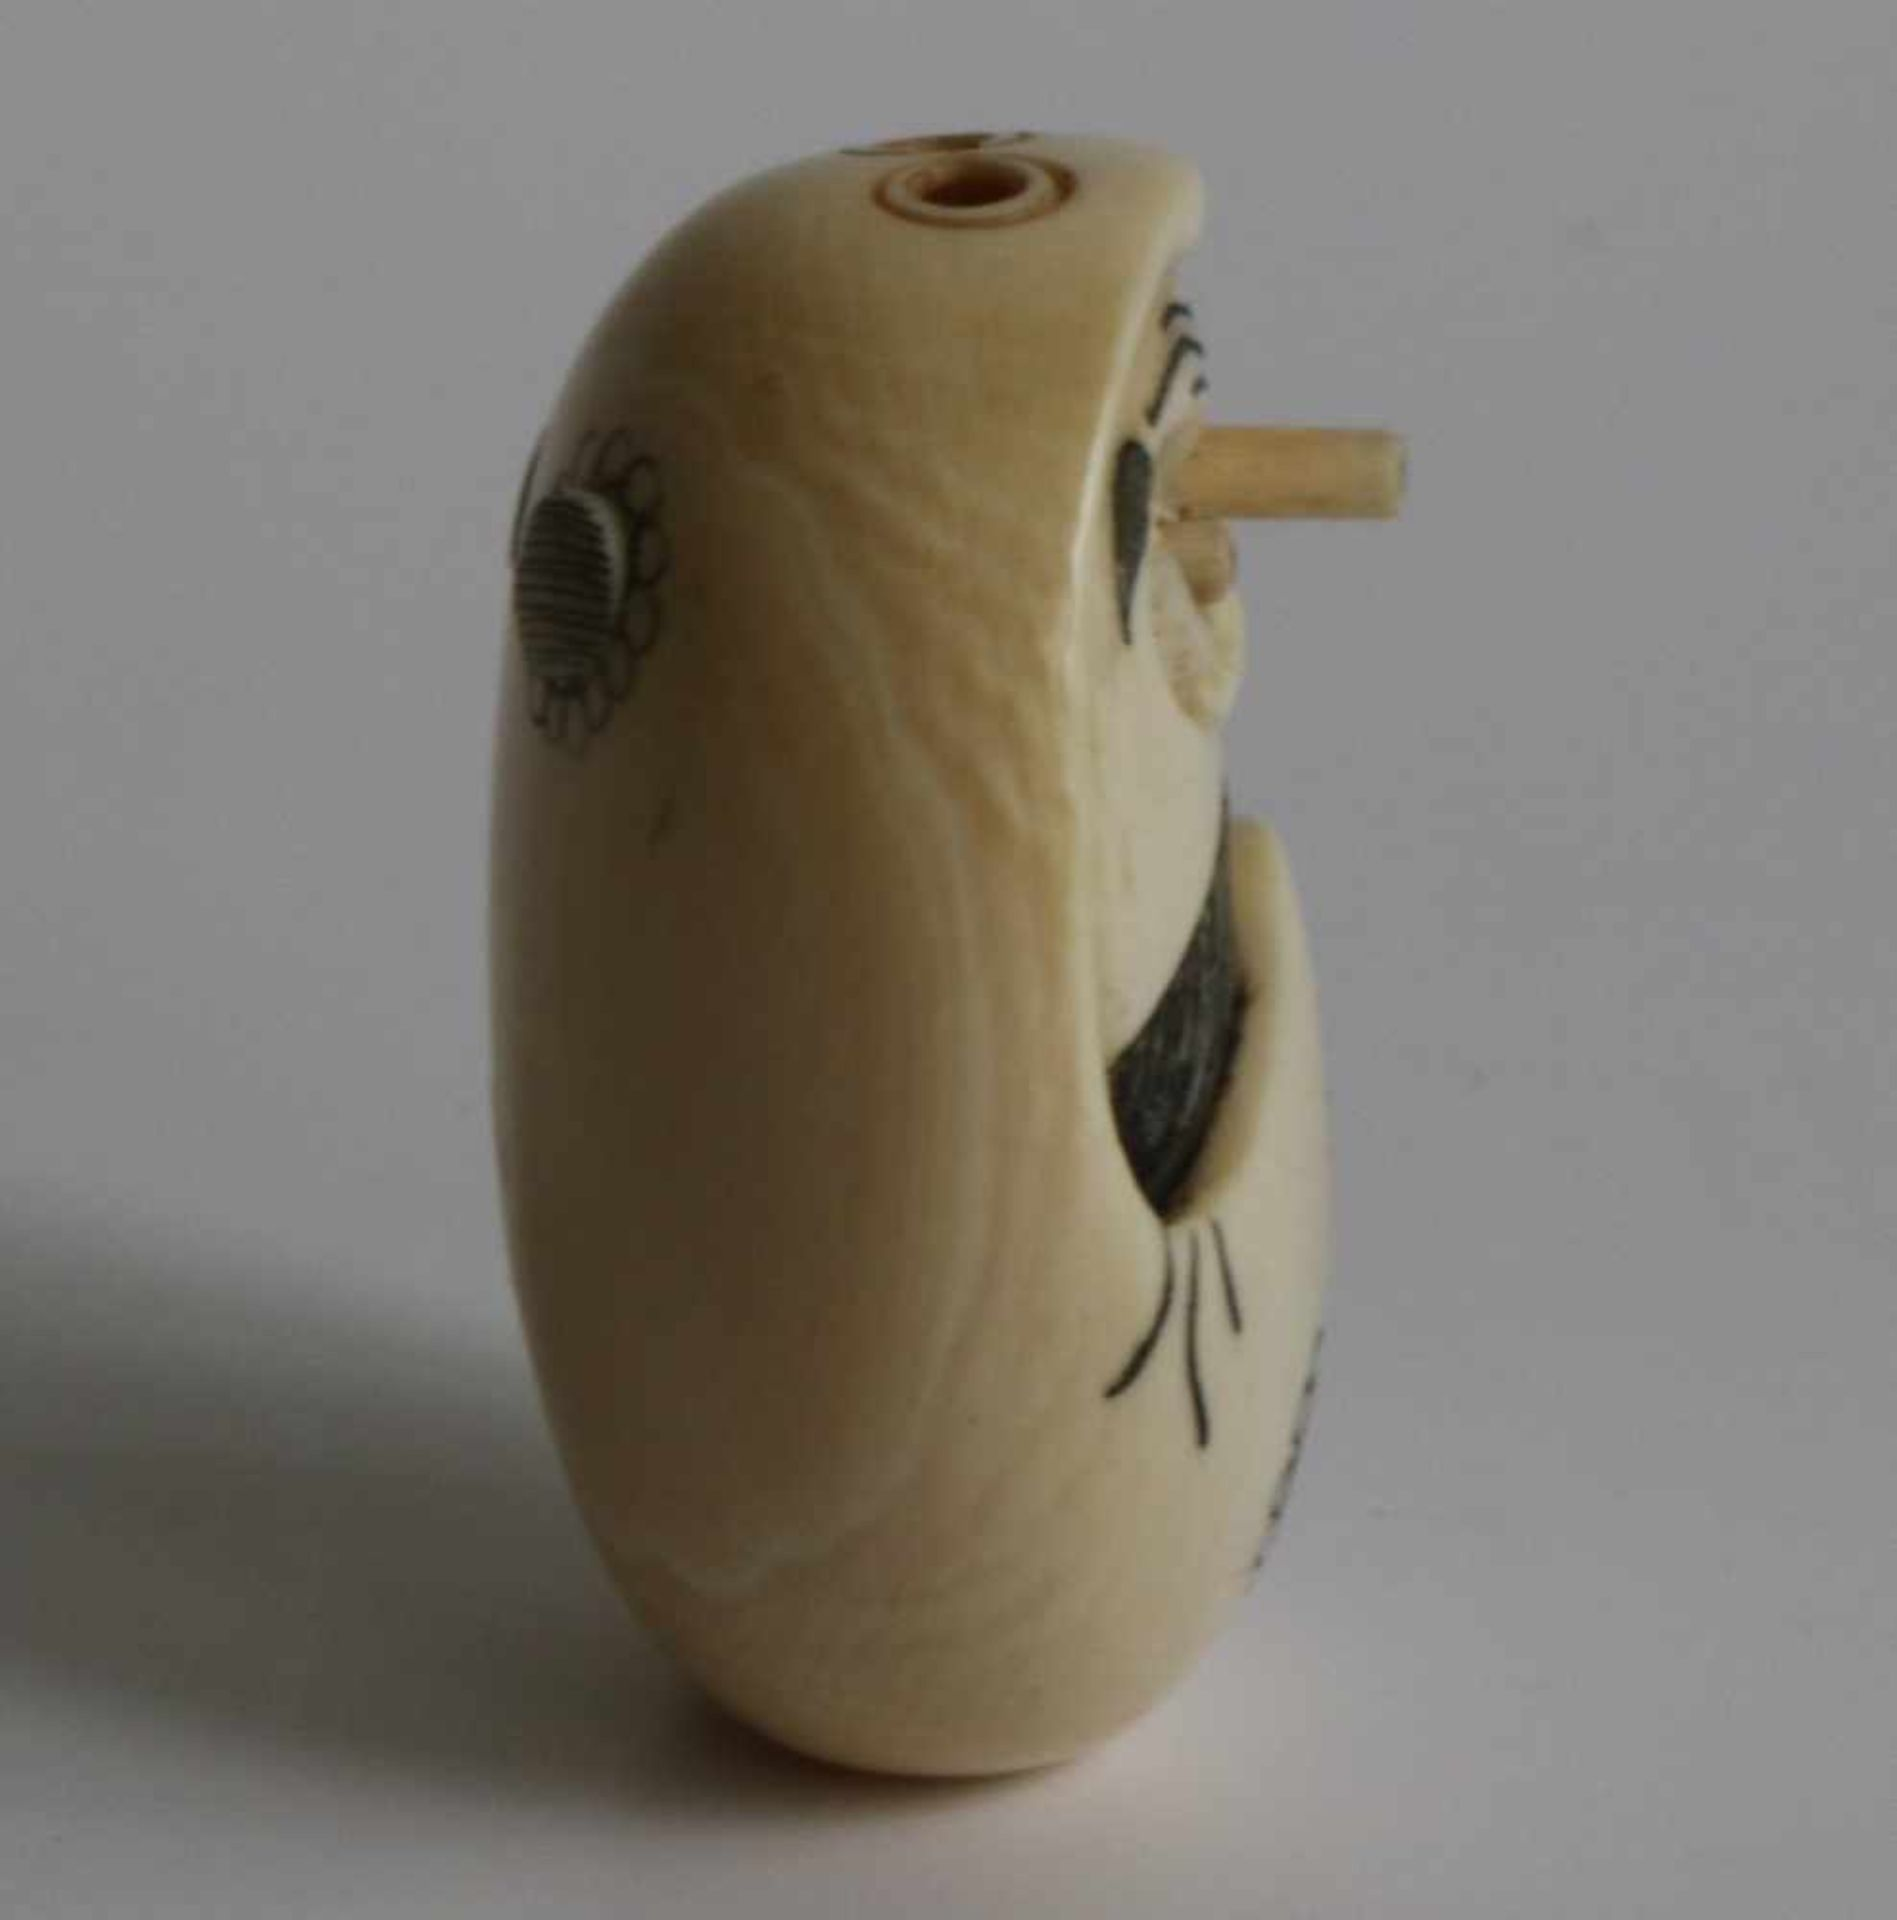 Los 486 - Netsuke Ivory Daruma depicting Daruma with popping eyes Japan TAISHO period L 4 cm small damage to